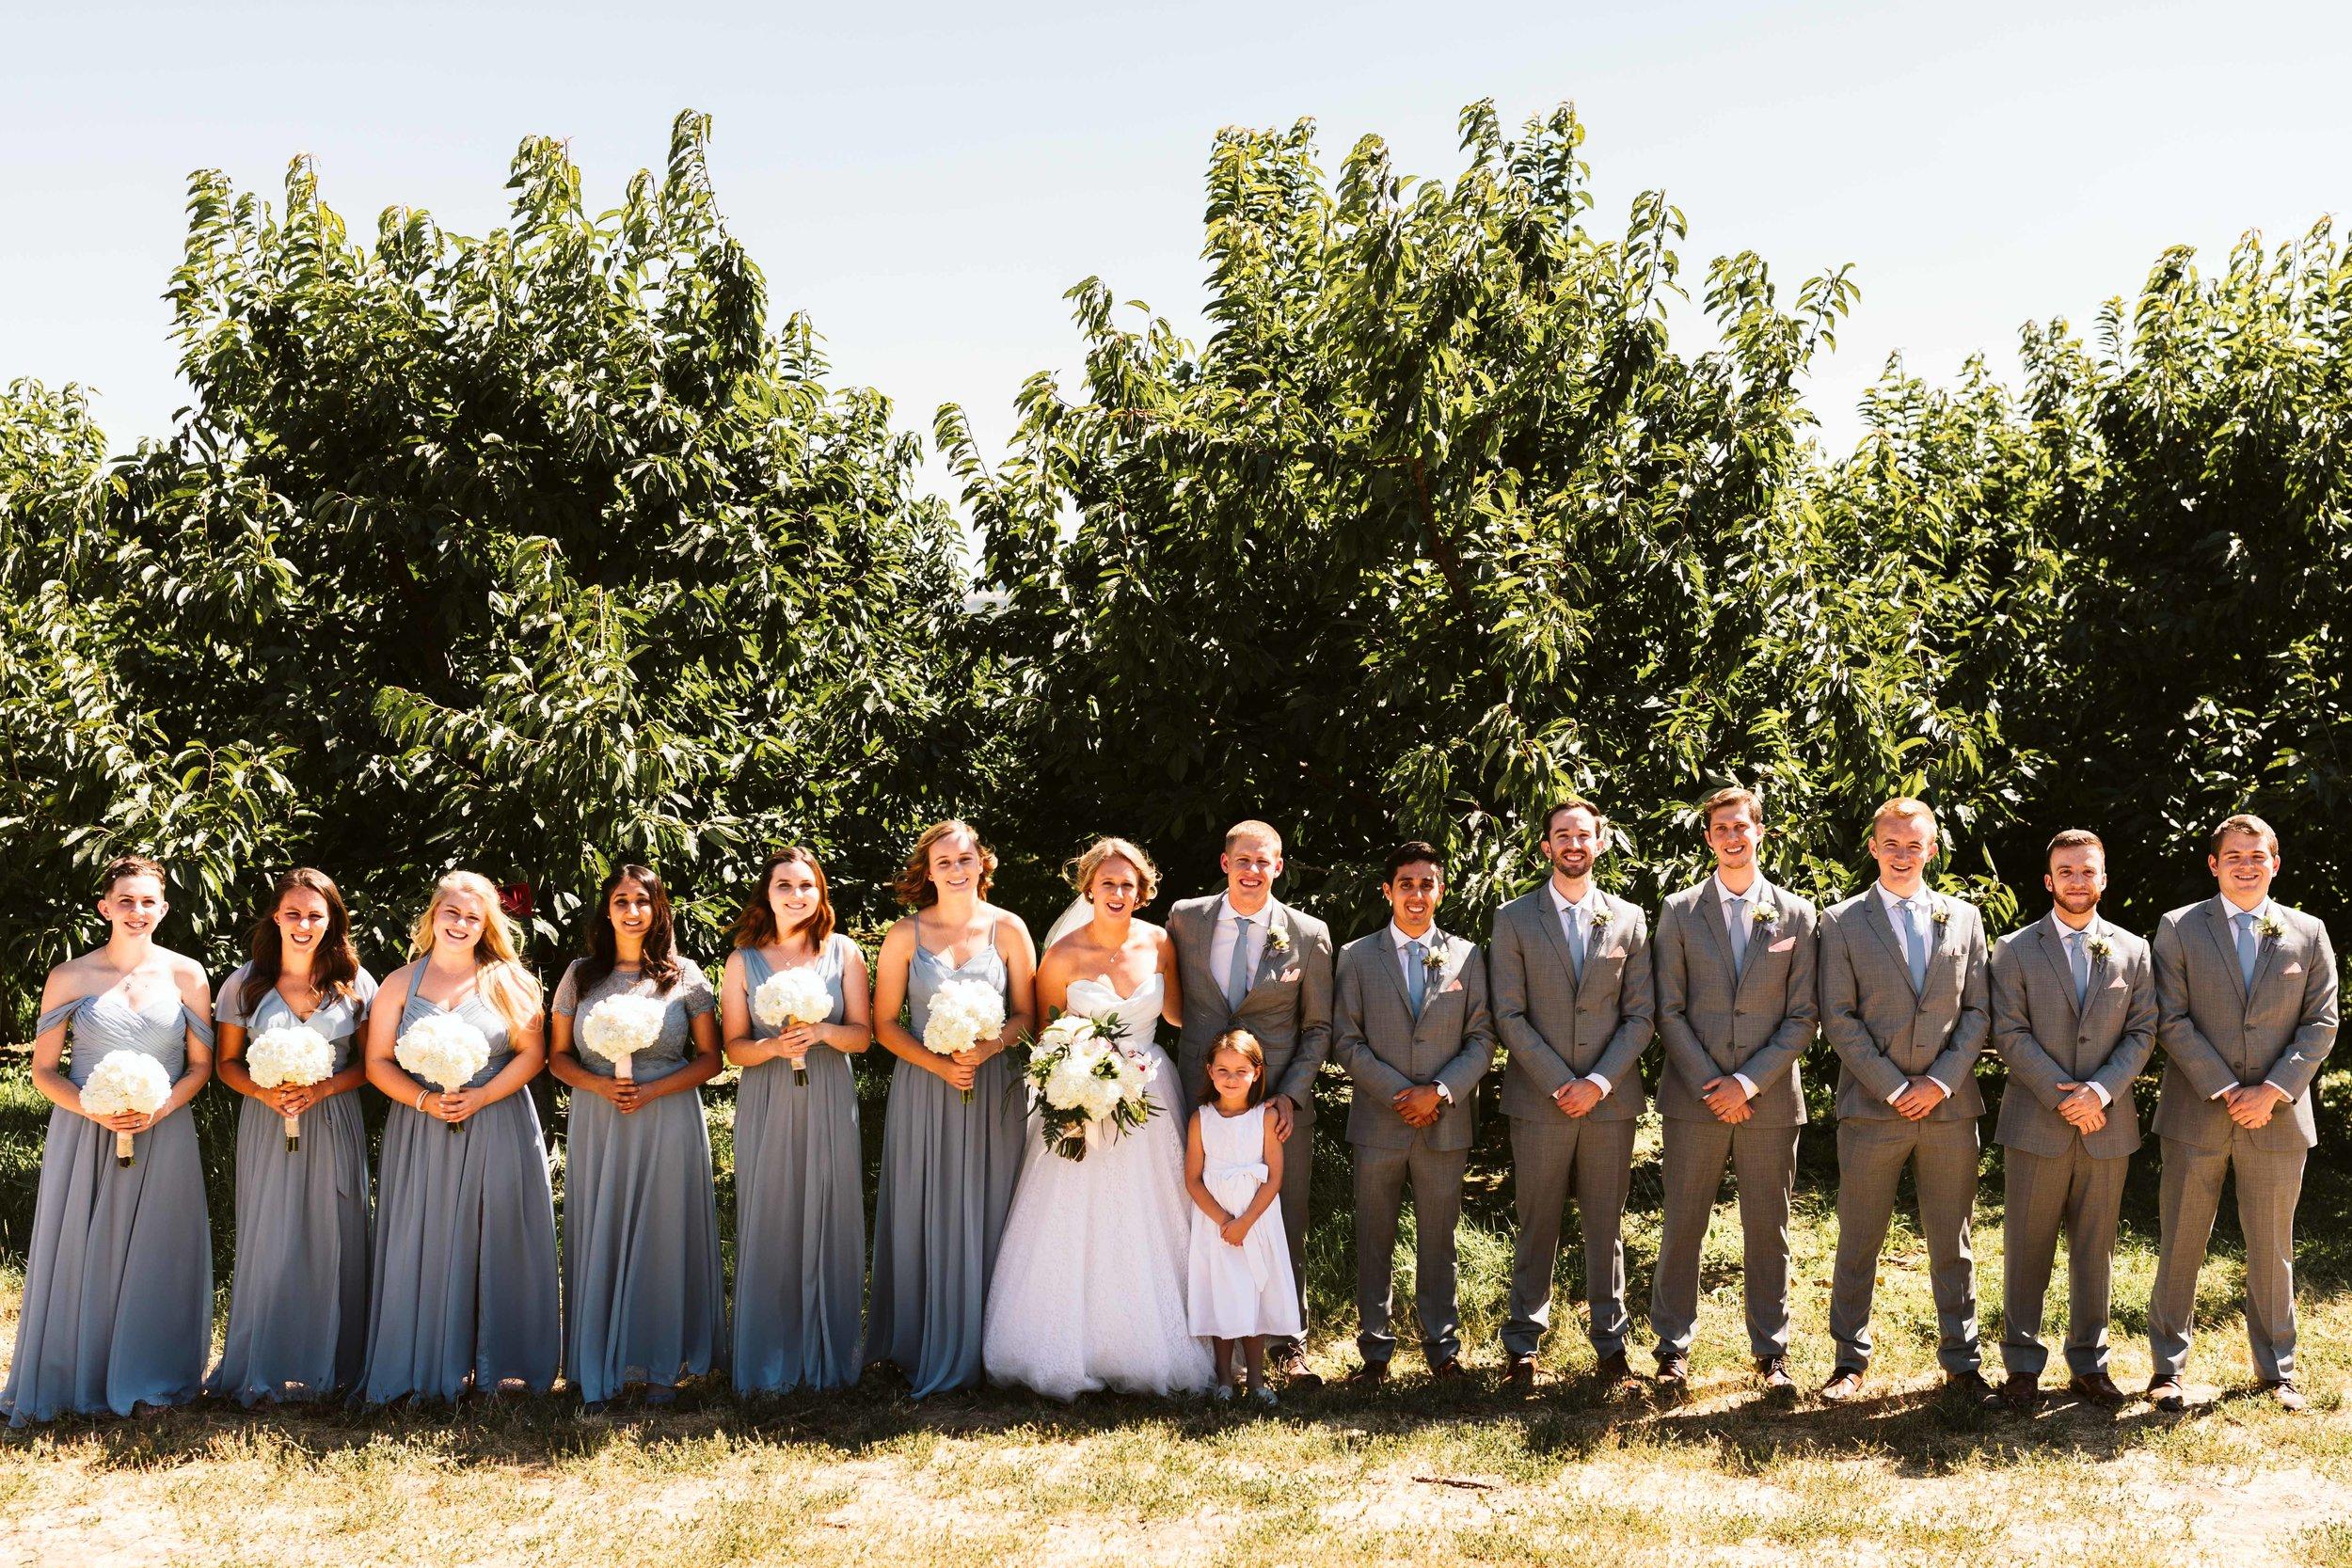 fontaine-estates-wedding-43.jpg